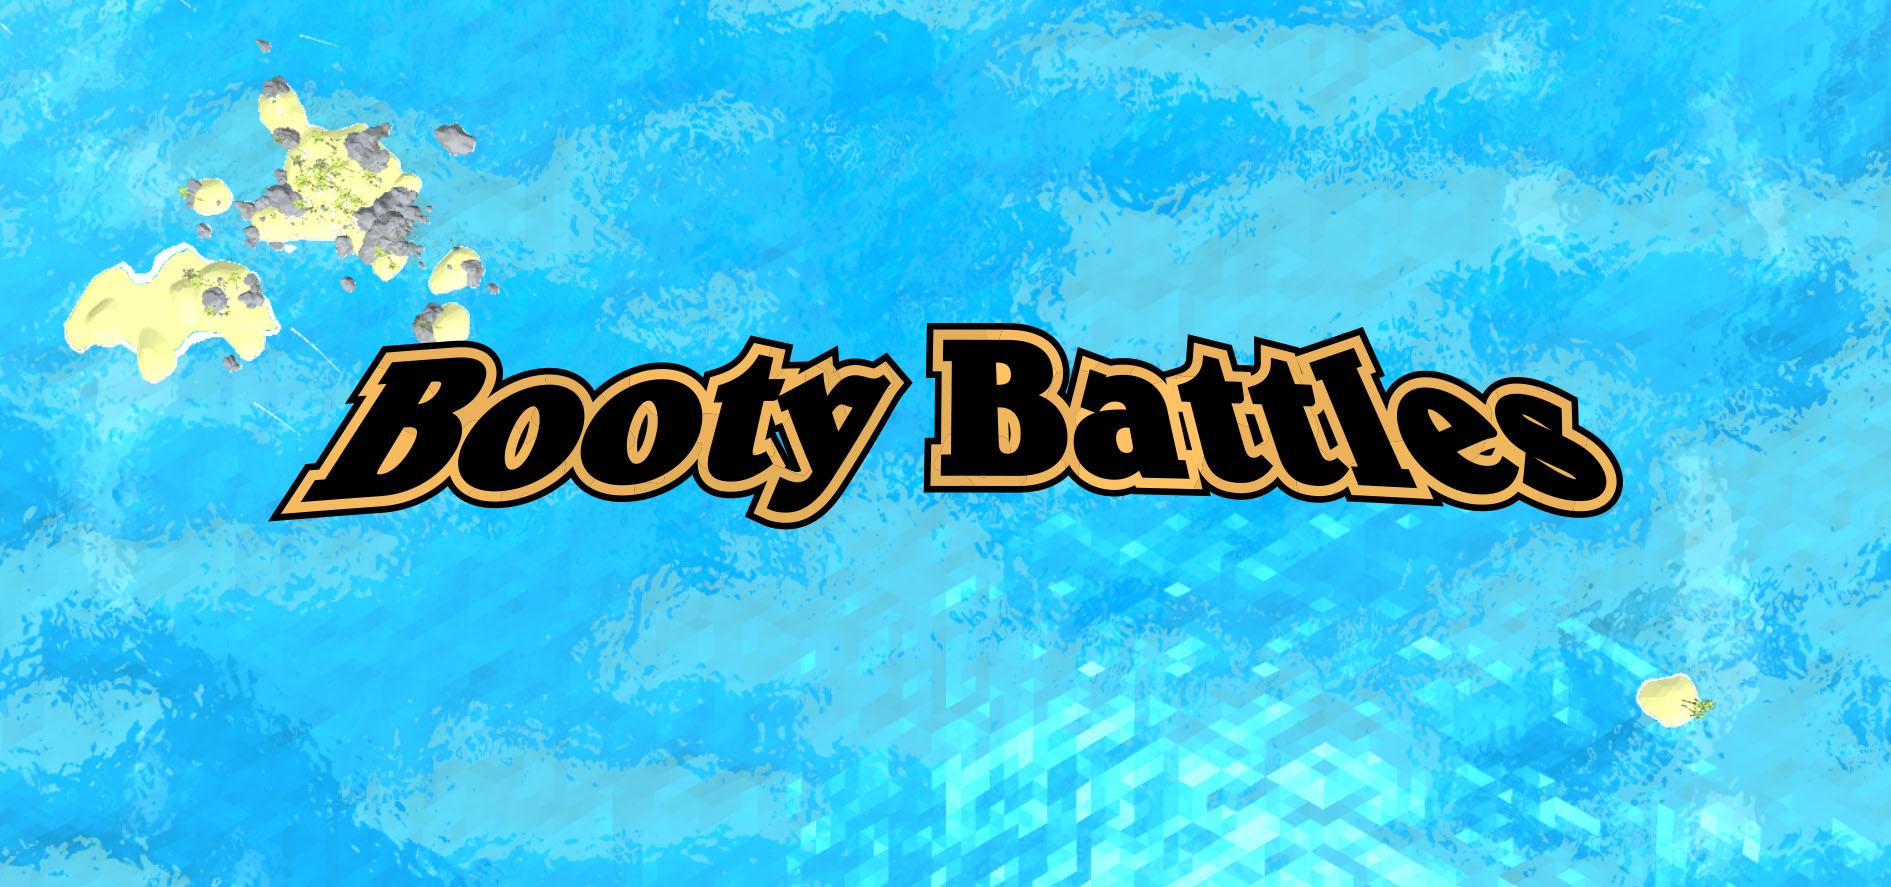 Booty Battles